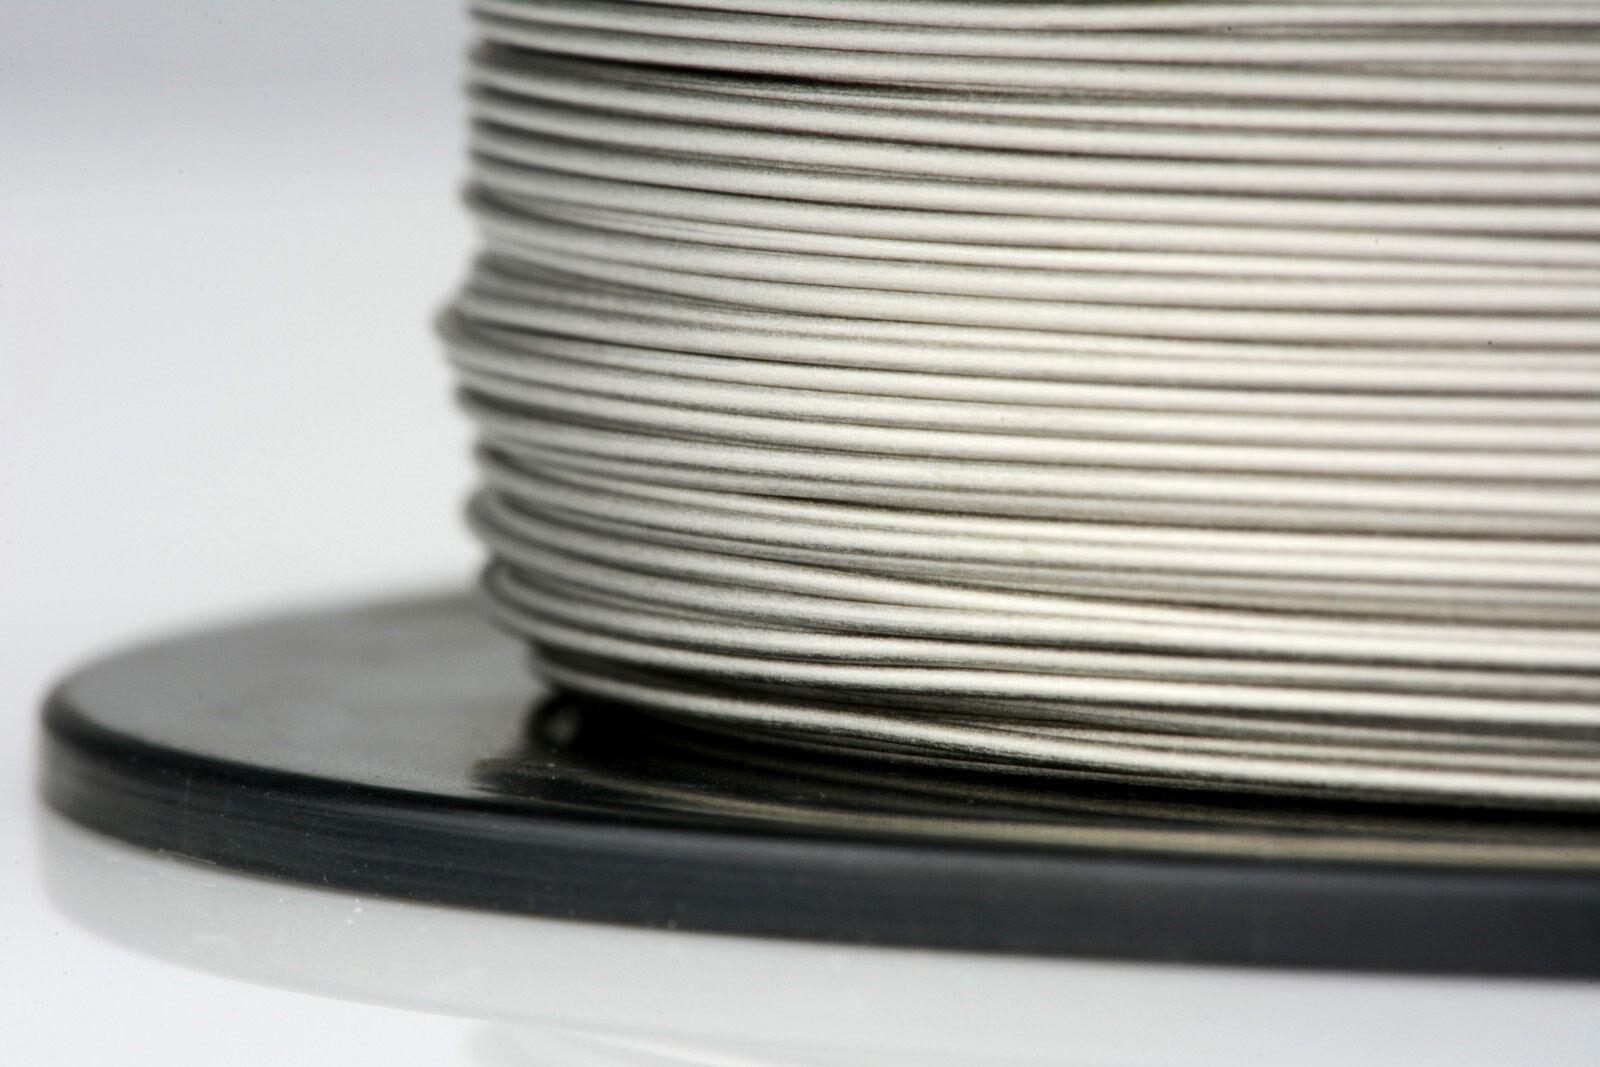 TEMCo Titanium Wire 26 Gauge 8 oz Surgical Grade 1 Resistance AWG ga 1183 ft